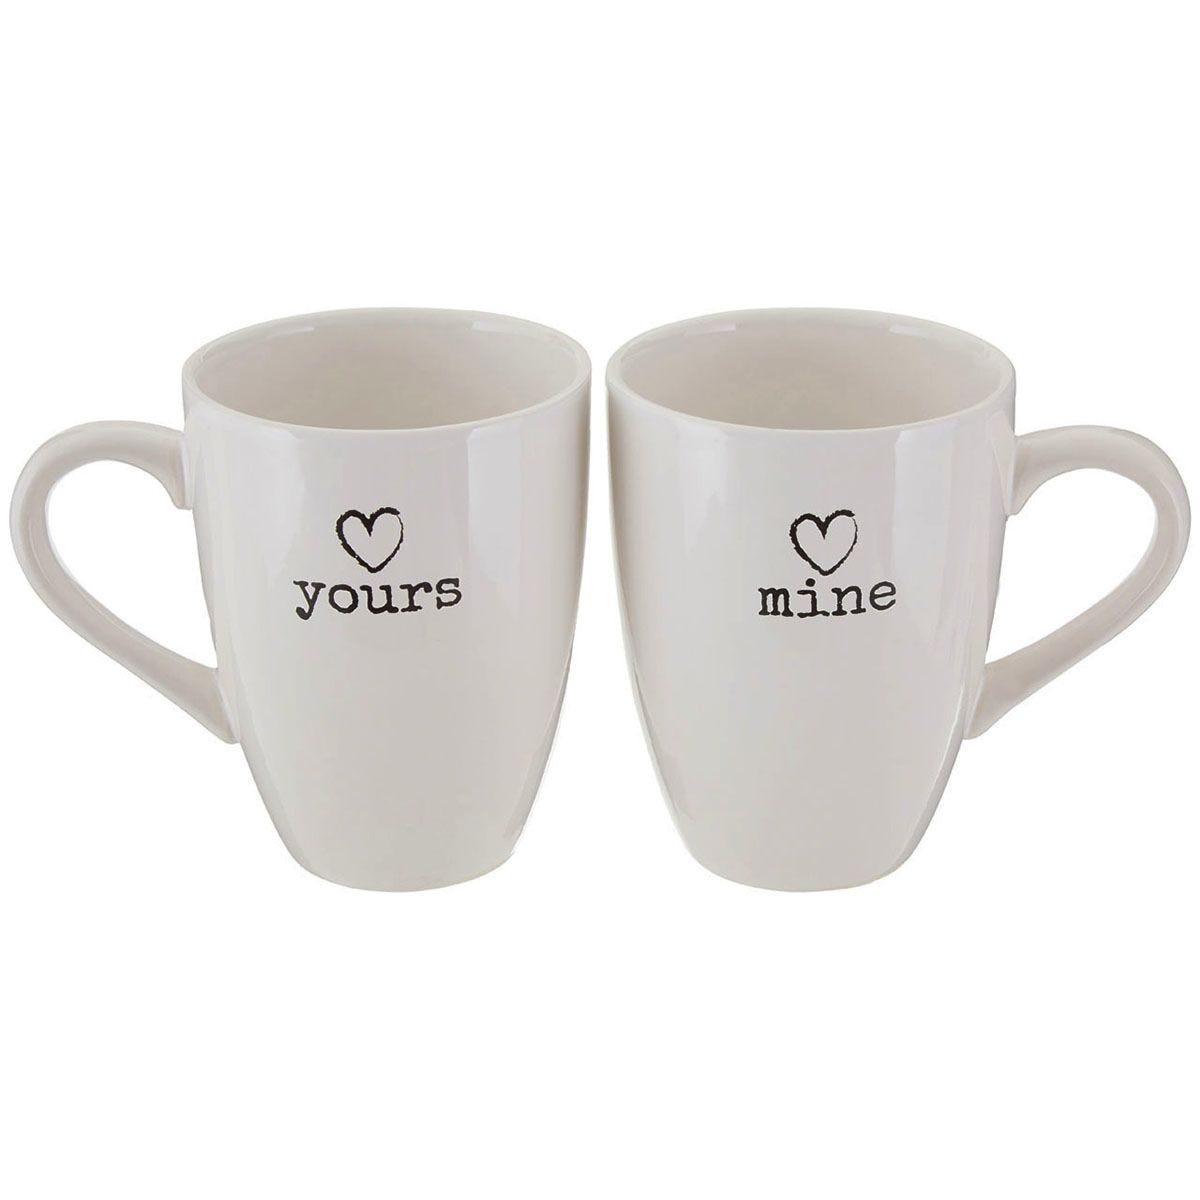 Premier Housewares Charm Mugs - Set of 2